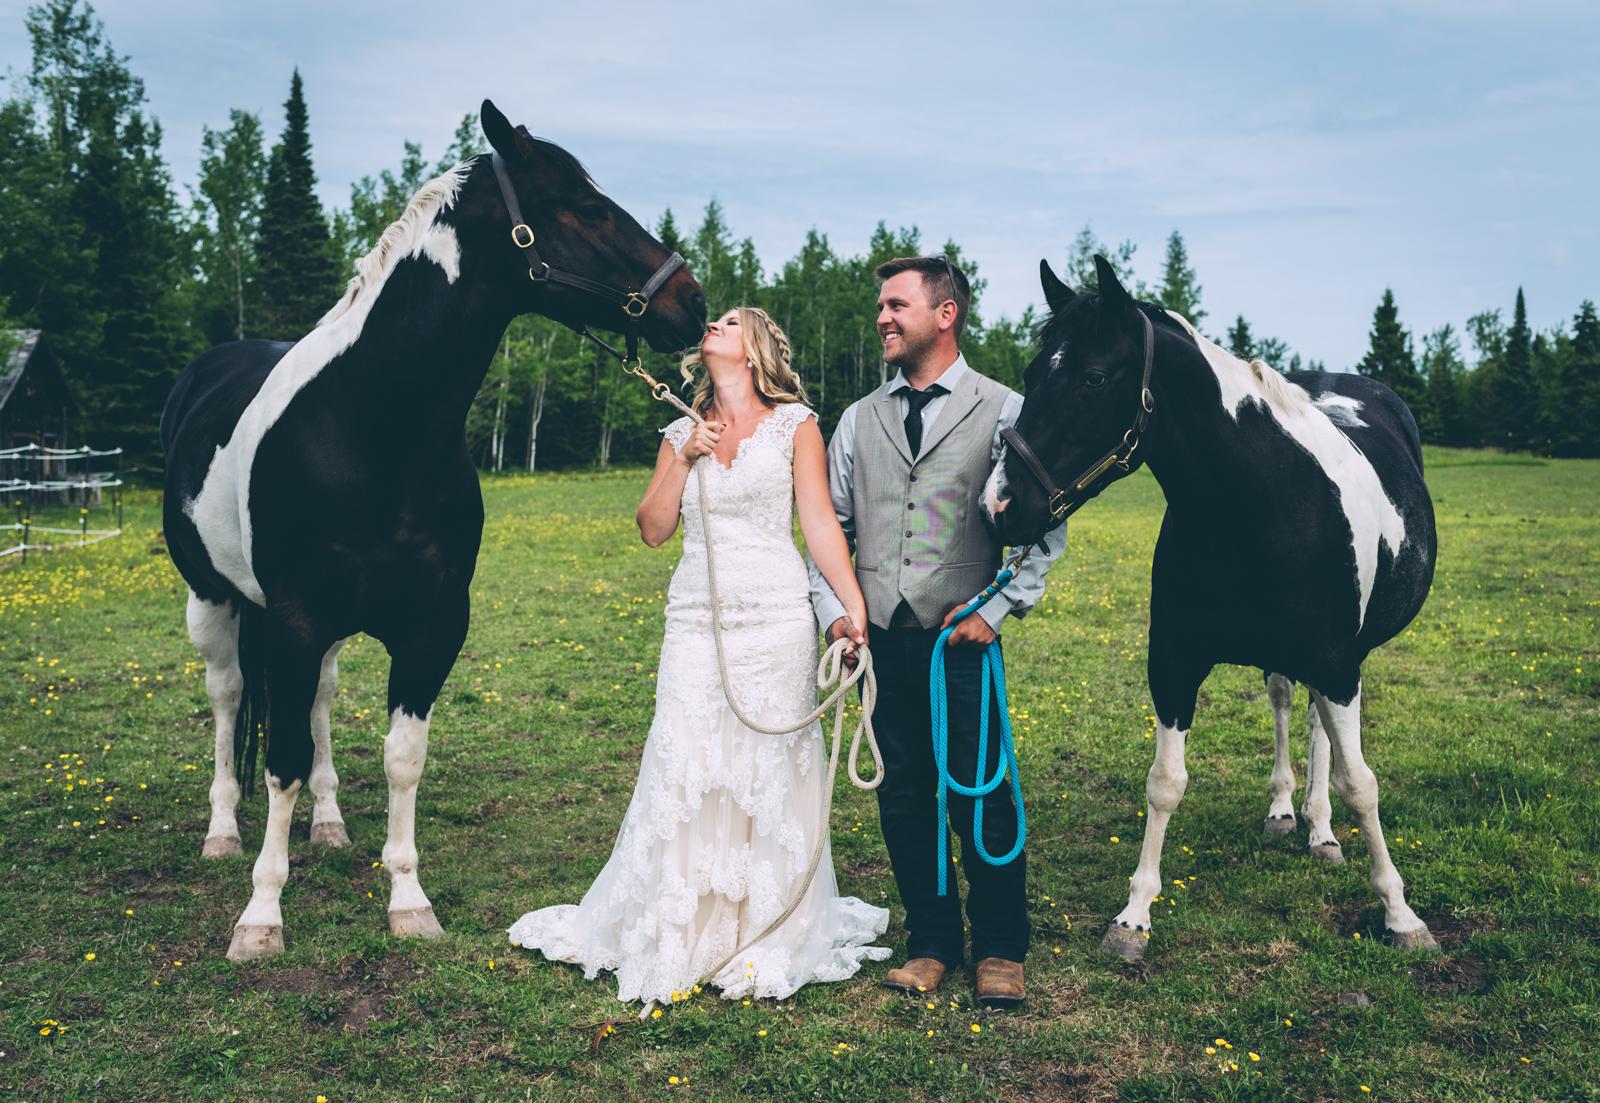 top-wedding-photos-2018-blog-37.jpg